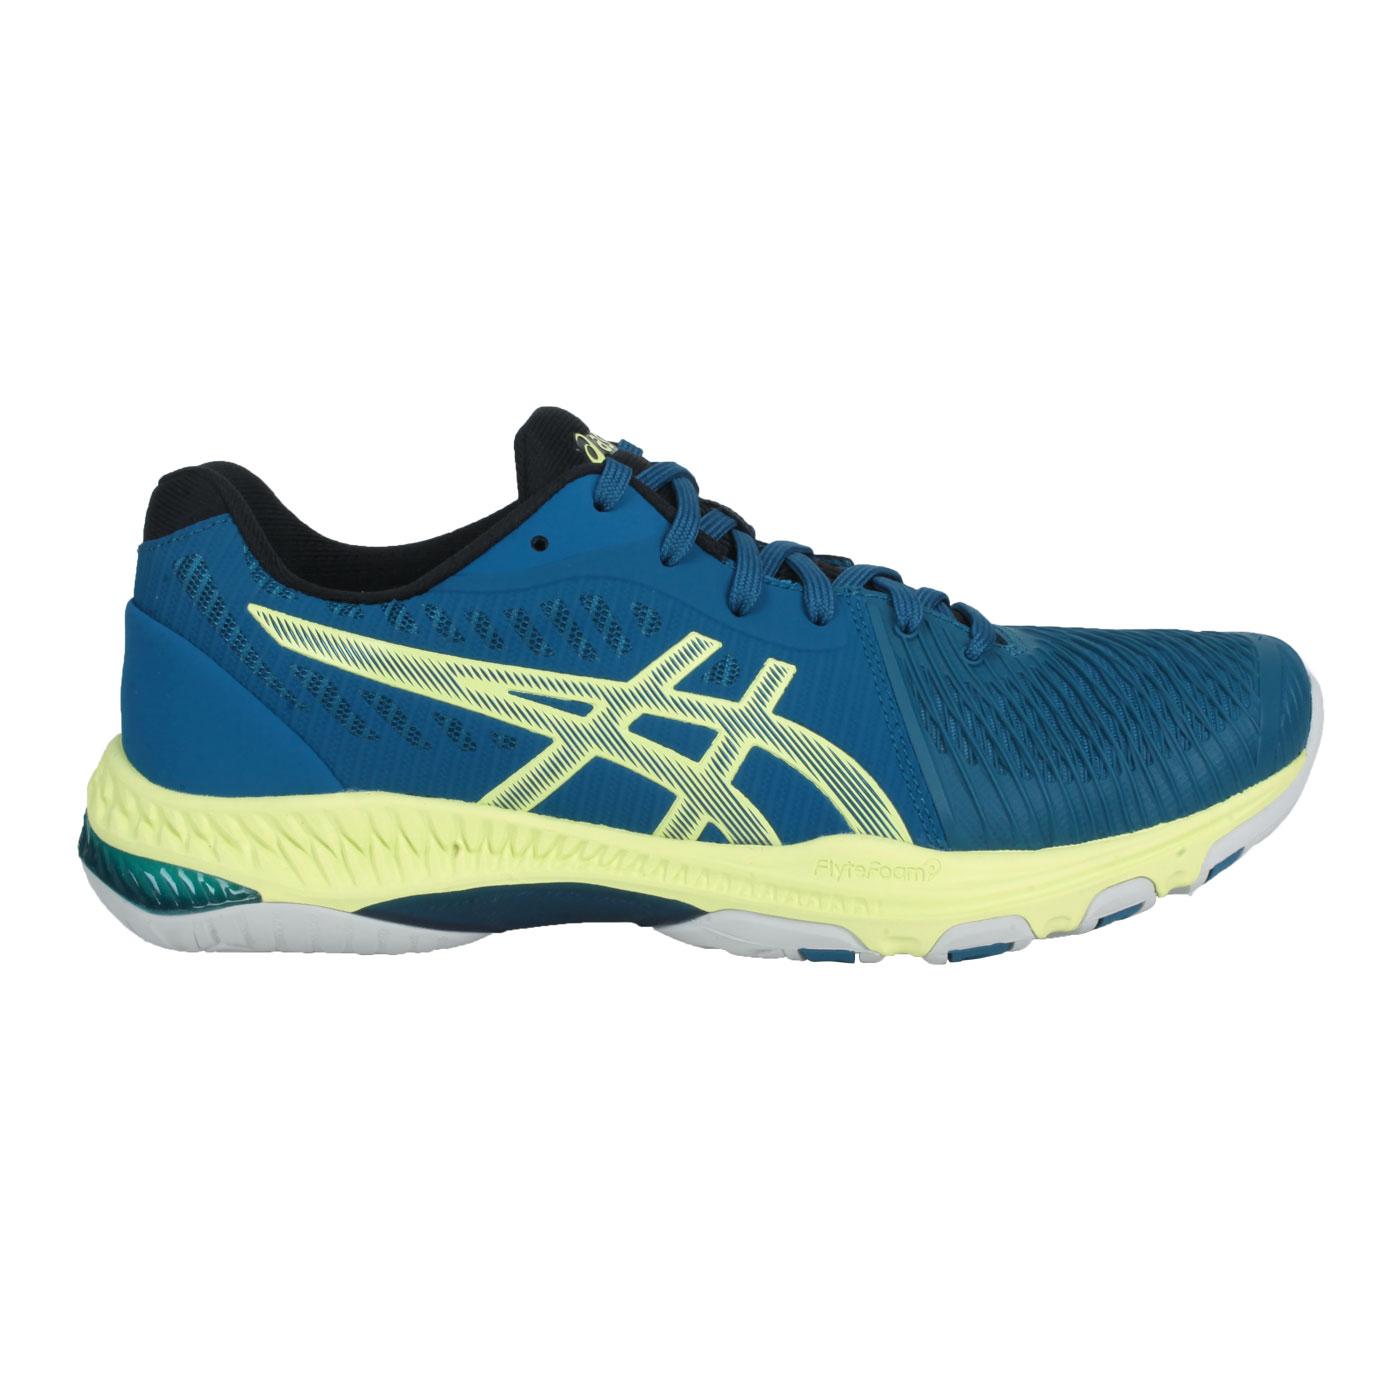 ASICS 男款排羽球鞋  @NETBURNER BALLISTIC FF 2@1051A041-404 - 藍綠螢光黃